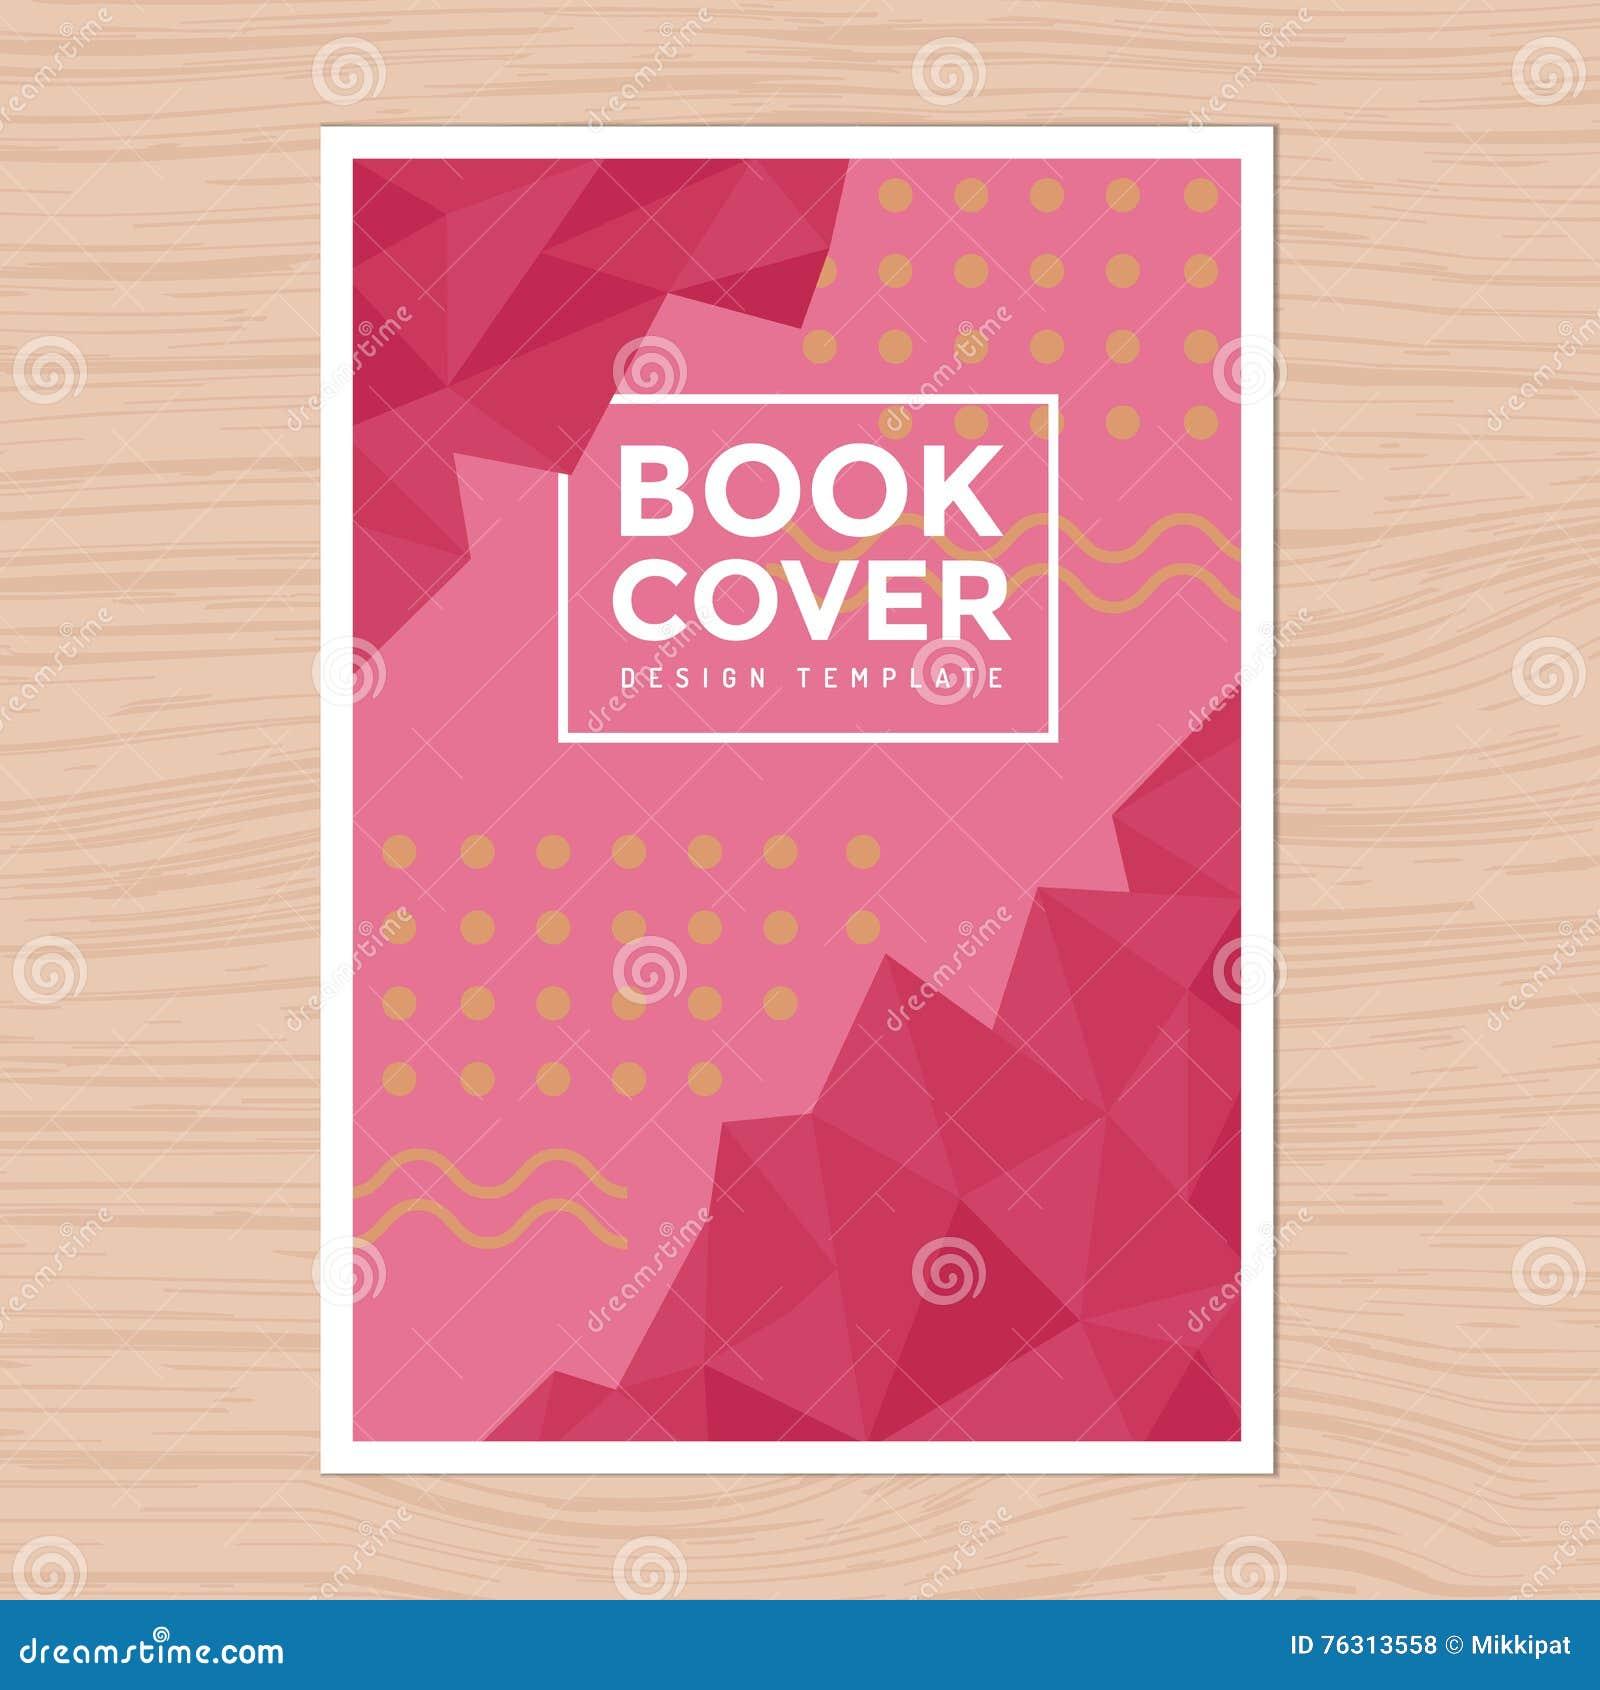 Simple Book Cover Number : 现代设计书套, poster, flyer, company公司概况,年终报告在a 大小的设计版面模板 向量例证